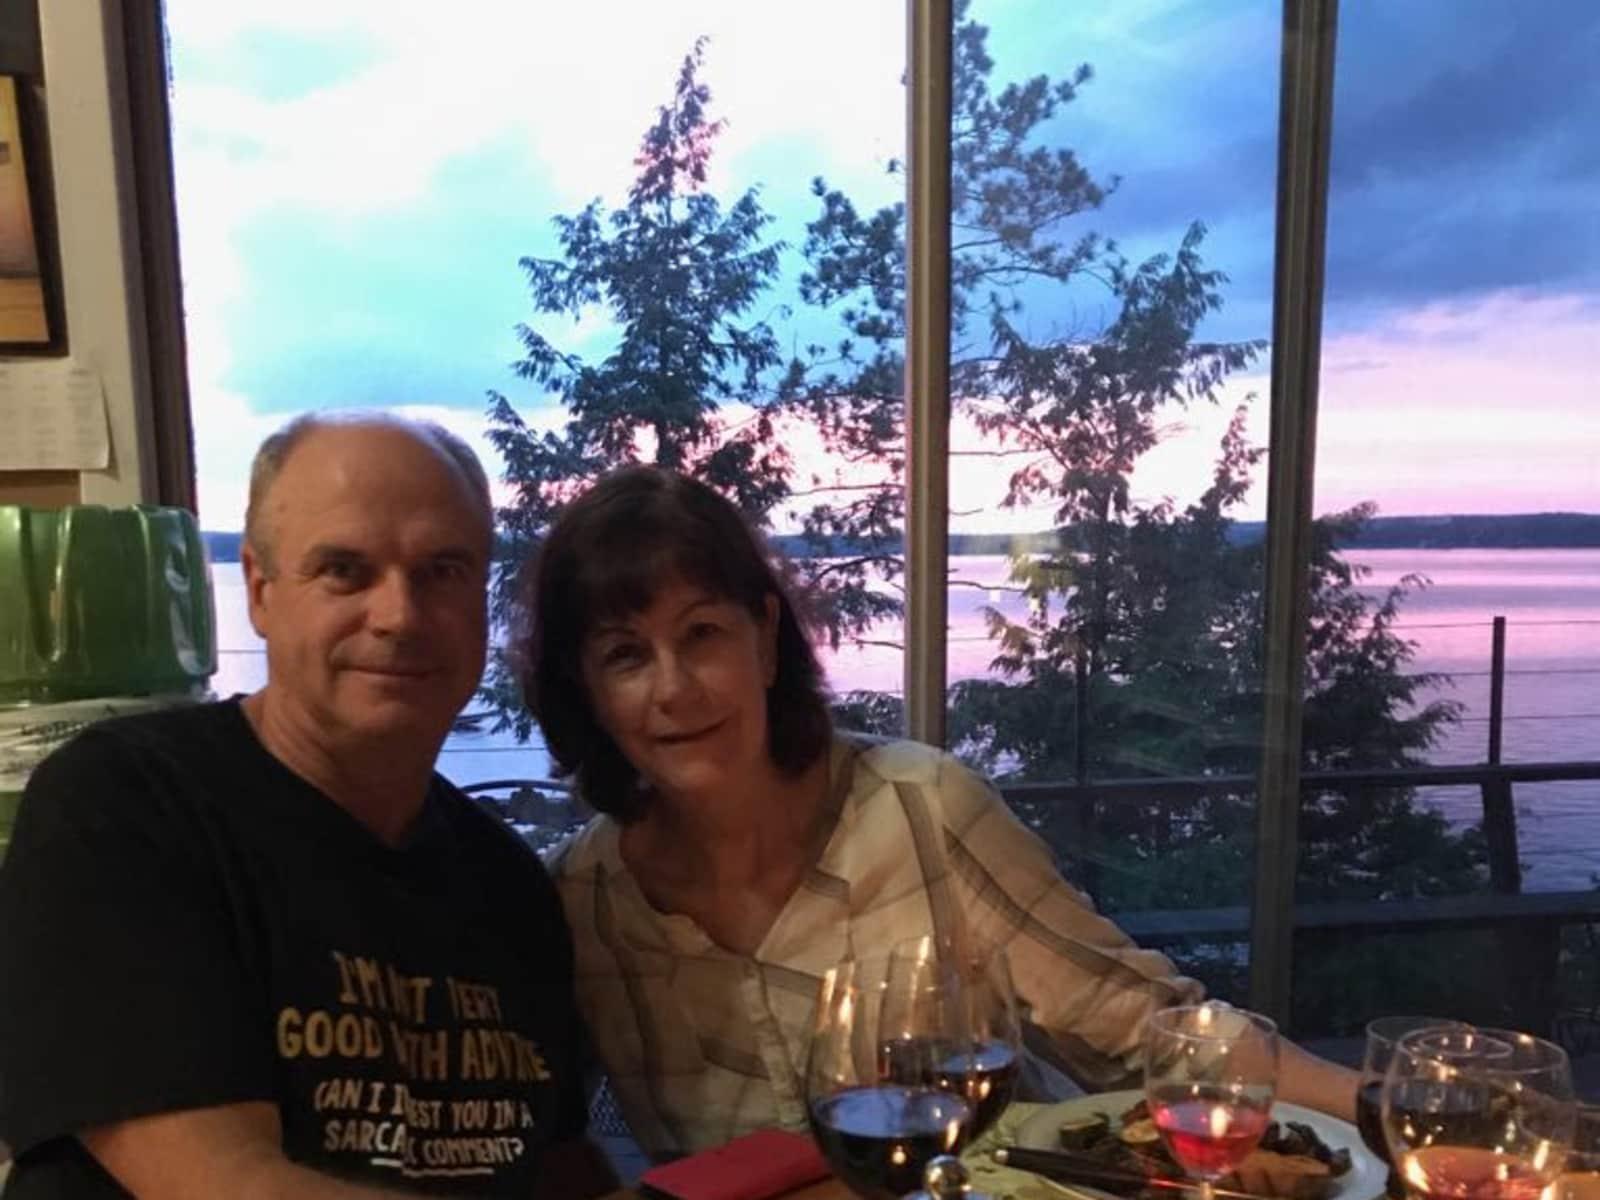 Colleen & Steve from Toronto, Ontario, Canada